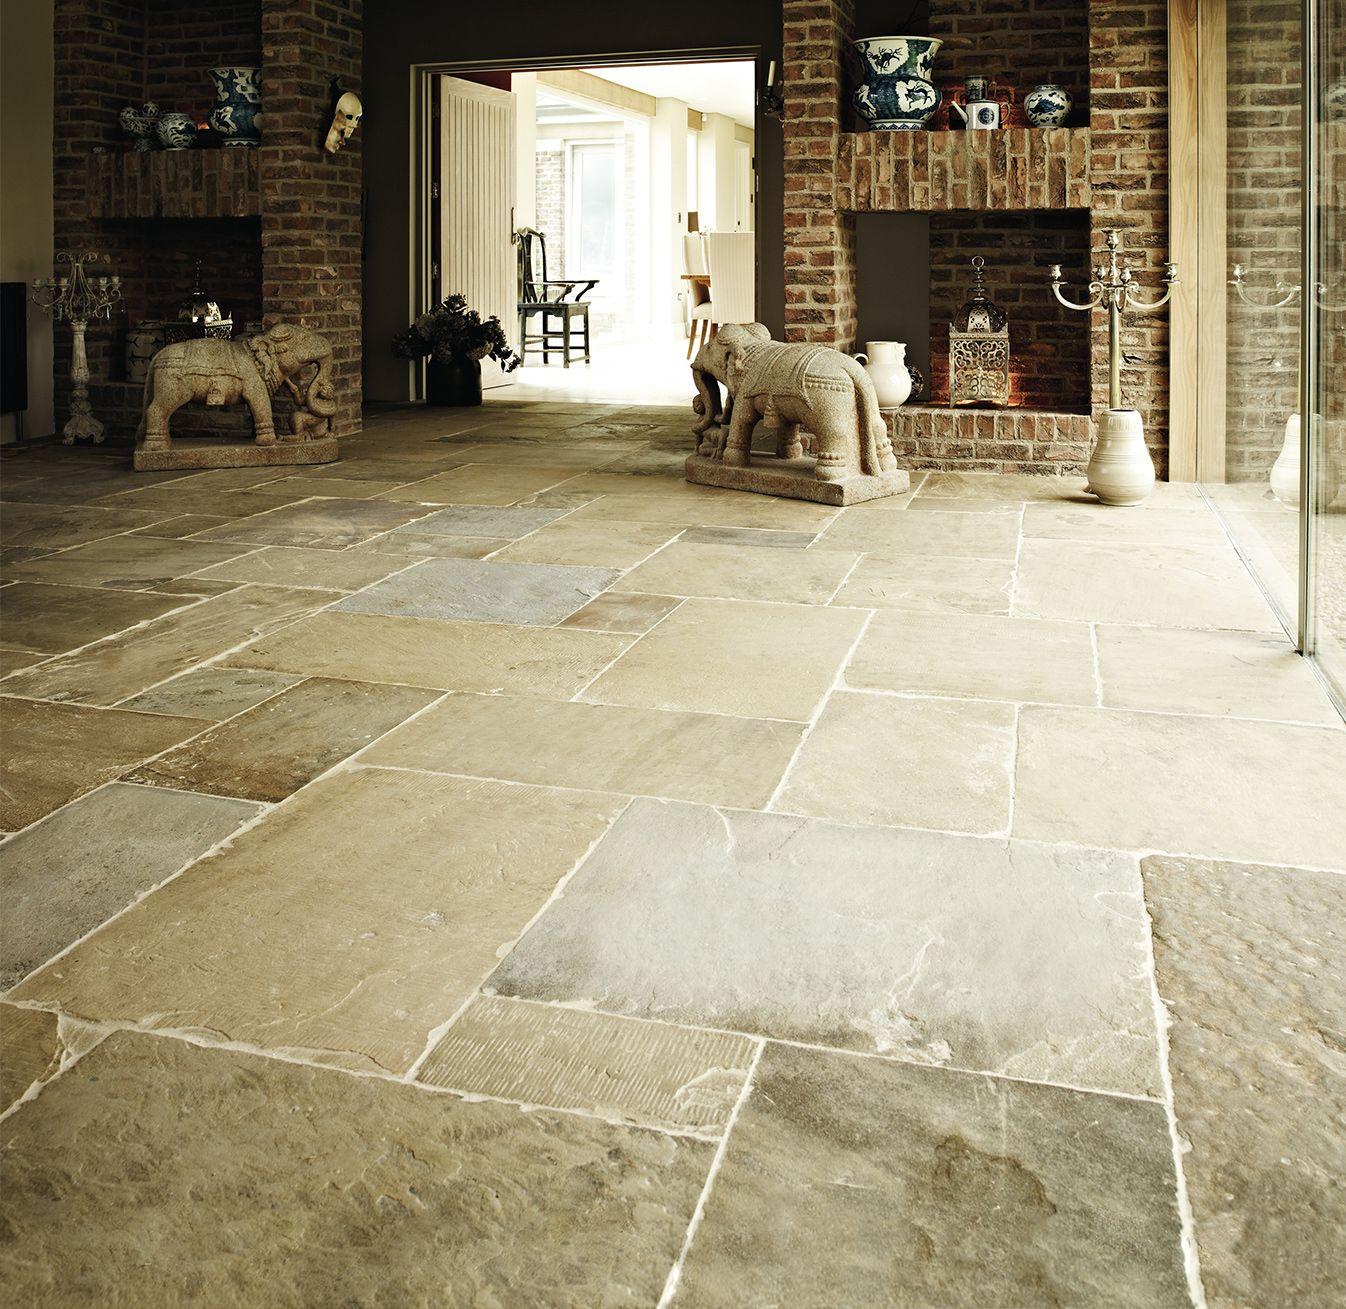 Flagstone floor natural flagstone tile flooring design kitchen flagstone floor natural flagstone tile flooring design dailygadgetfo Choice Image